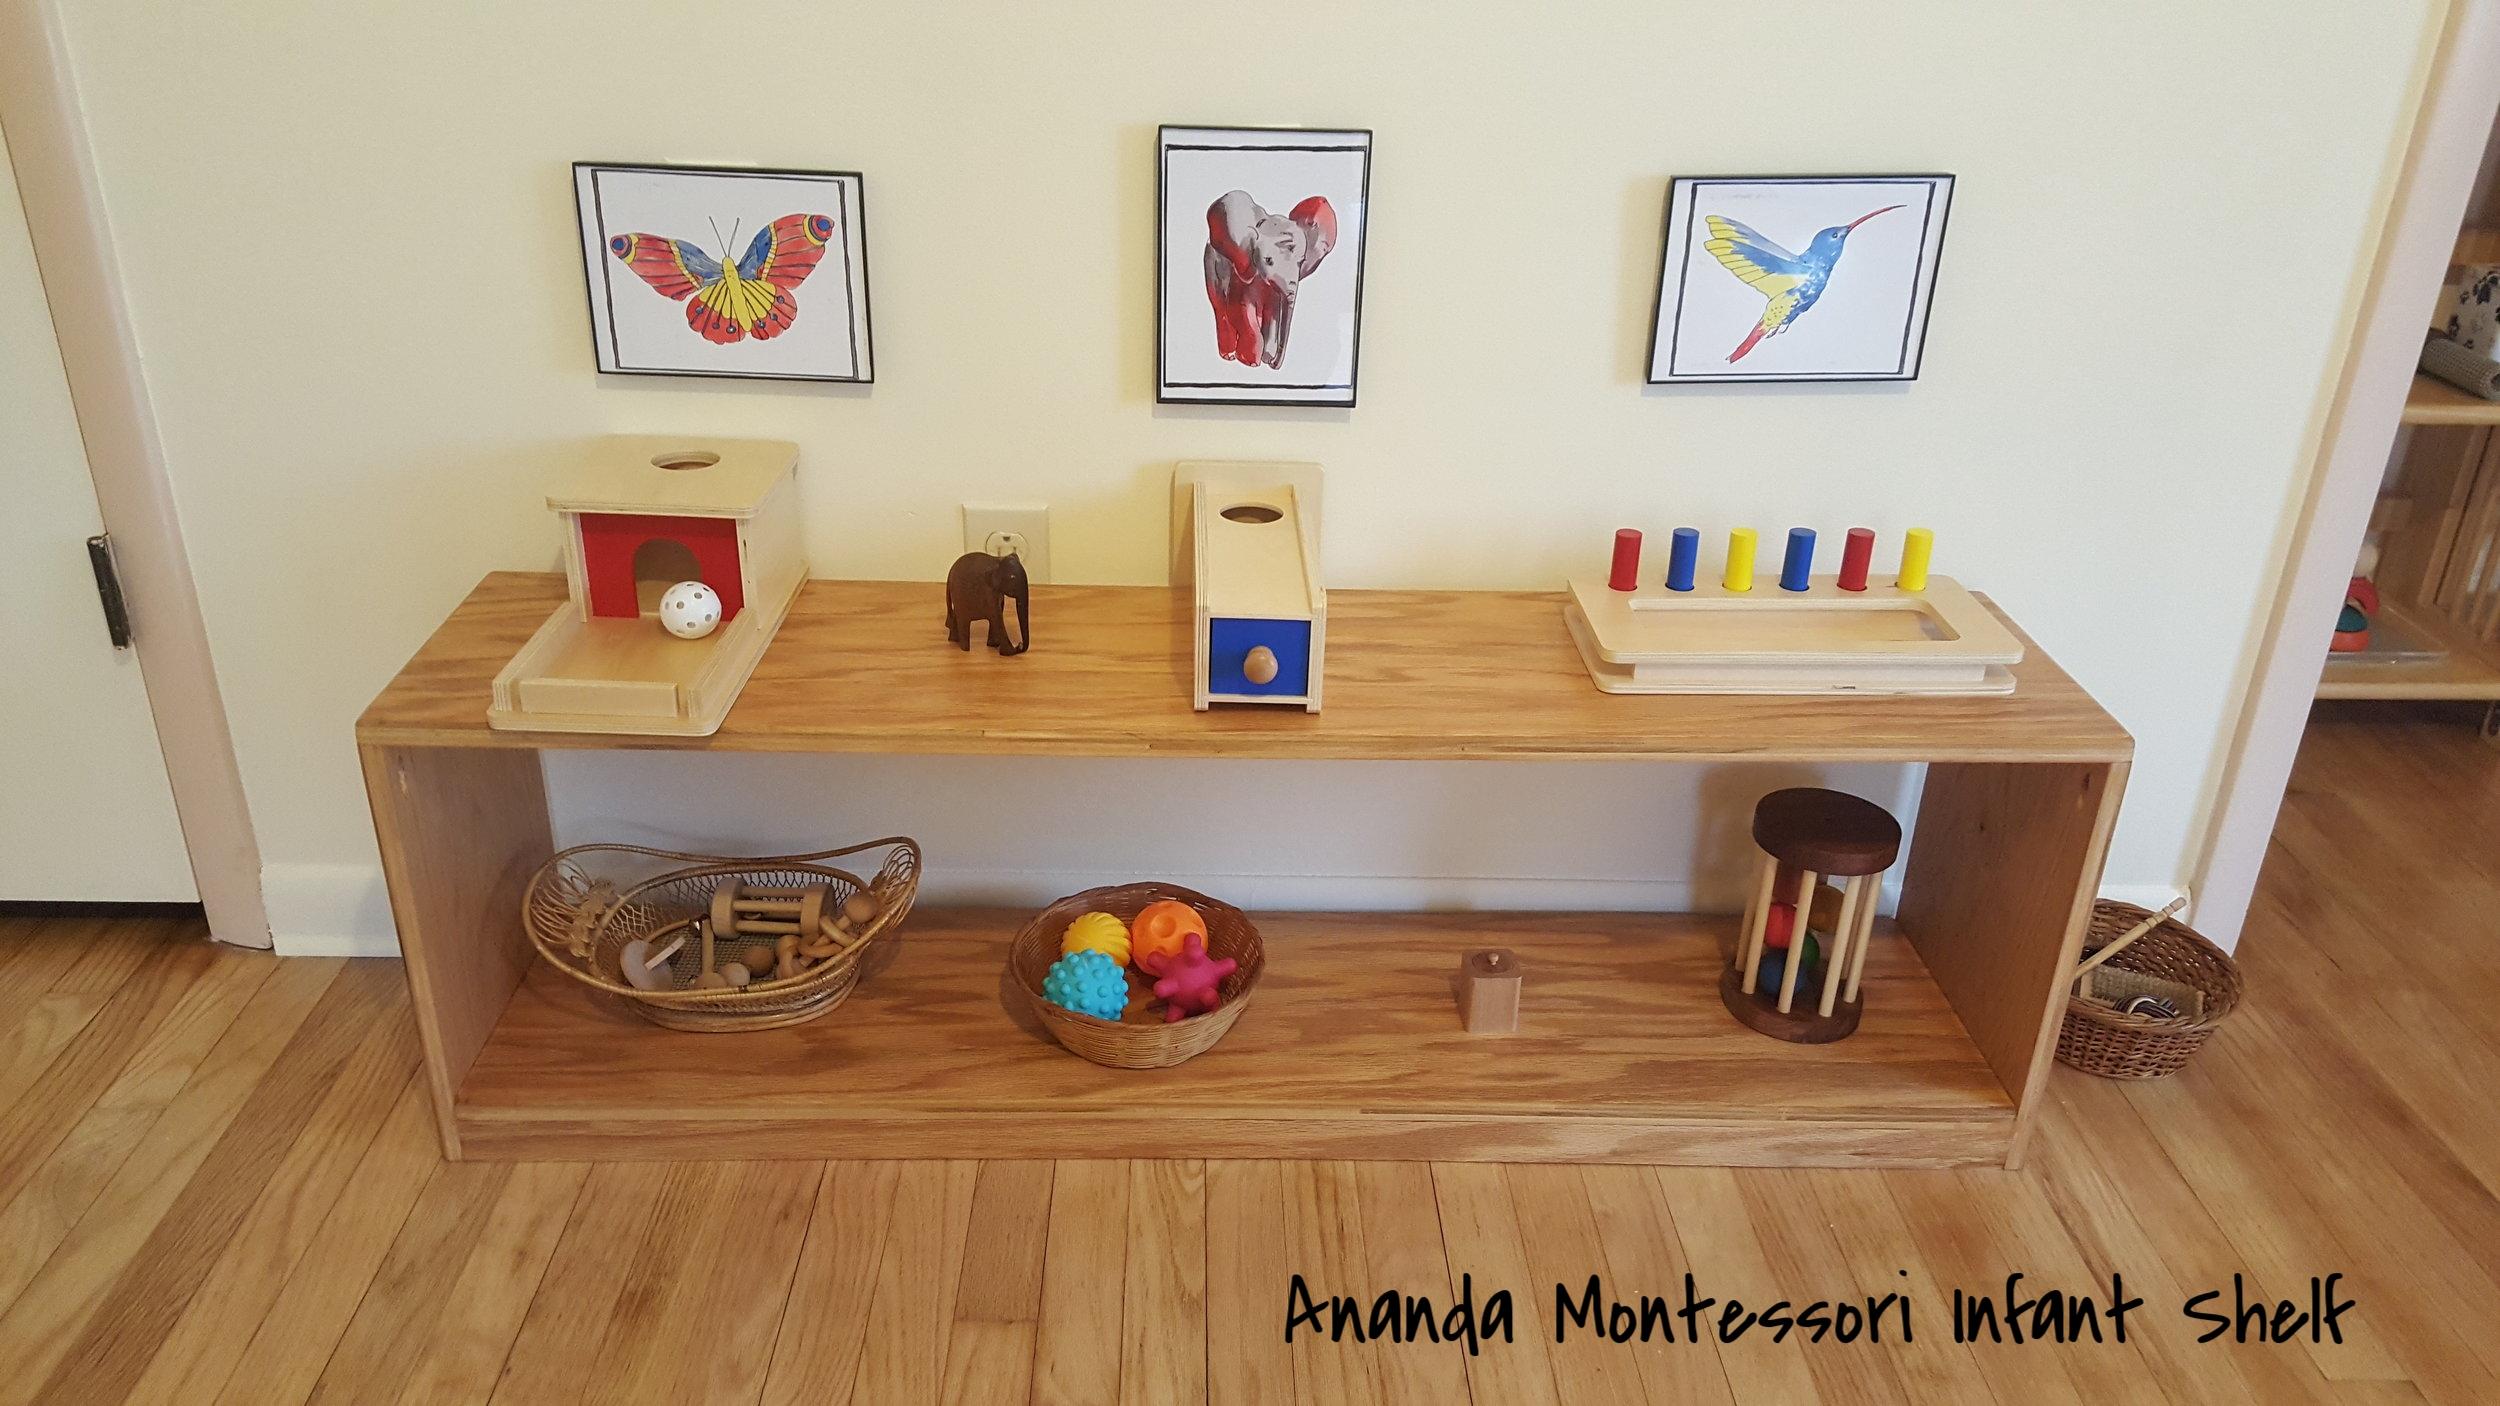 Ananda Montessori Infant Shelf